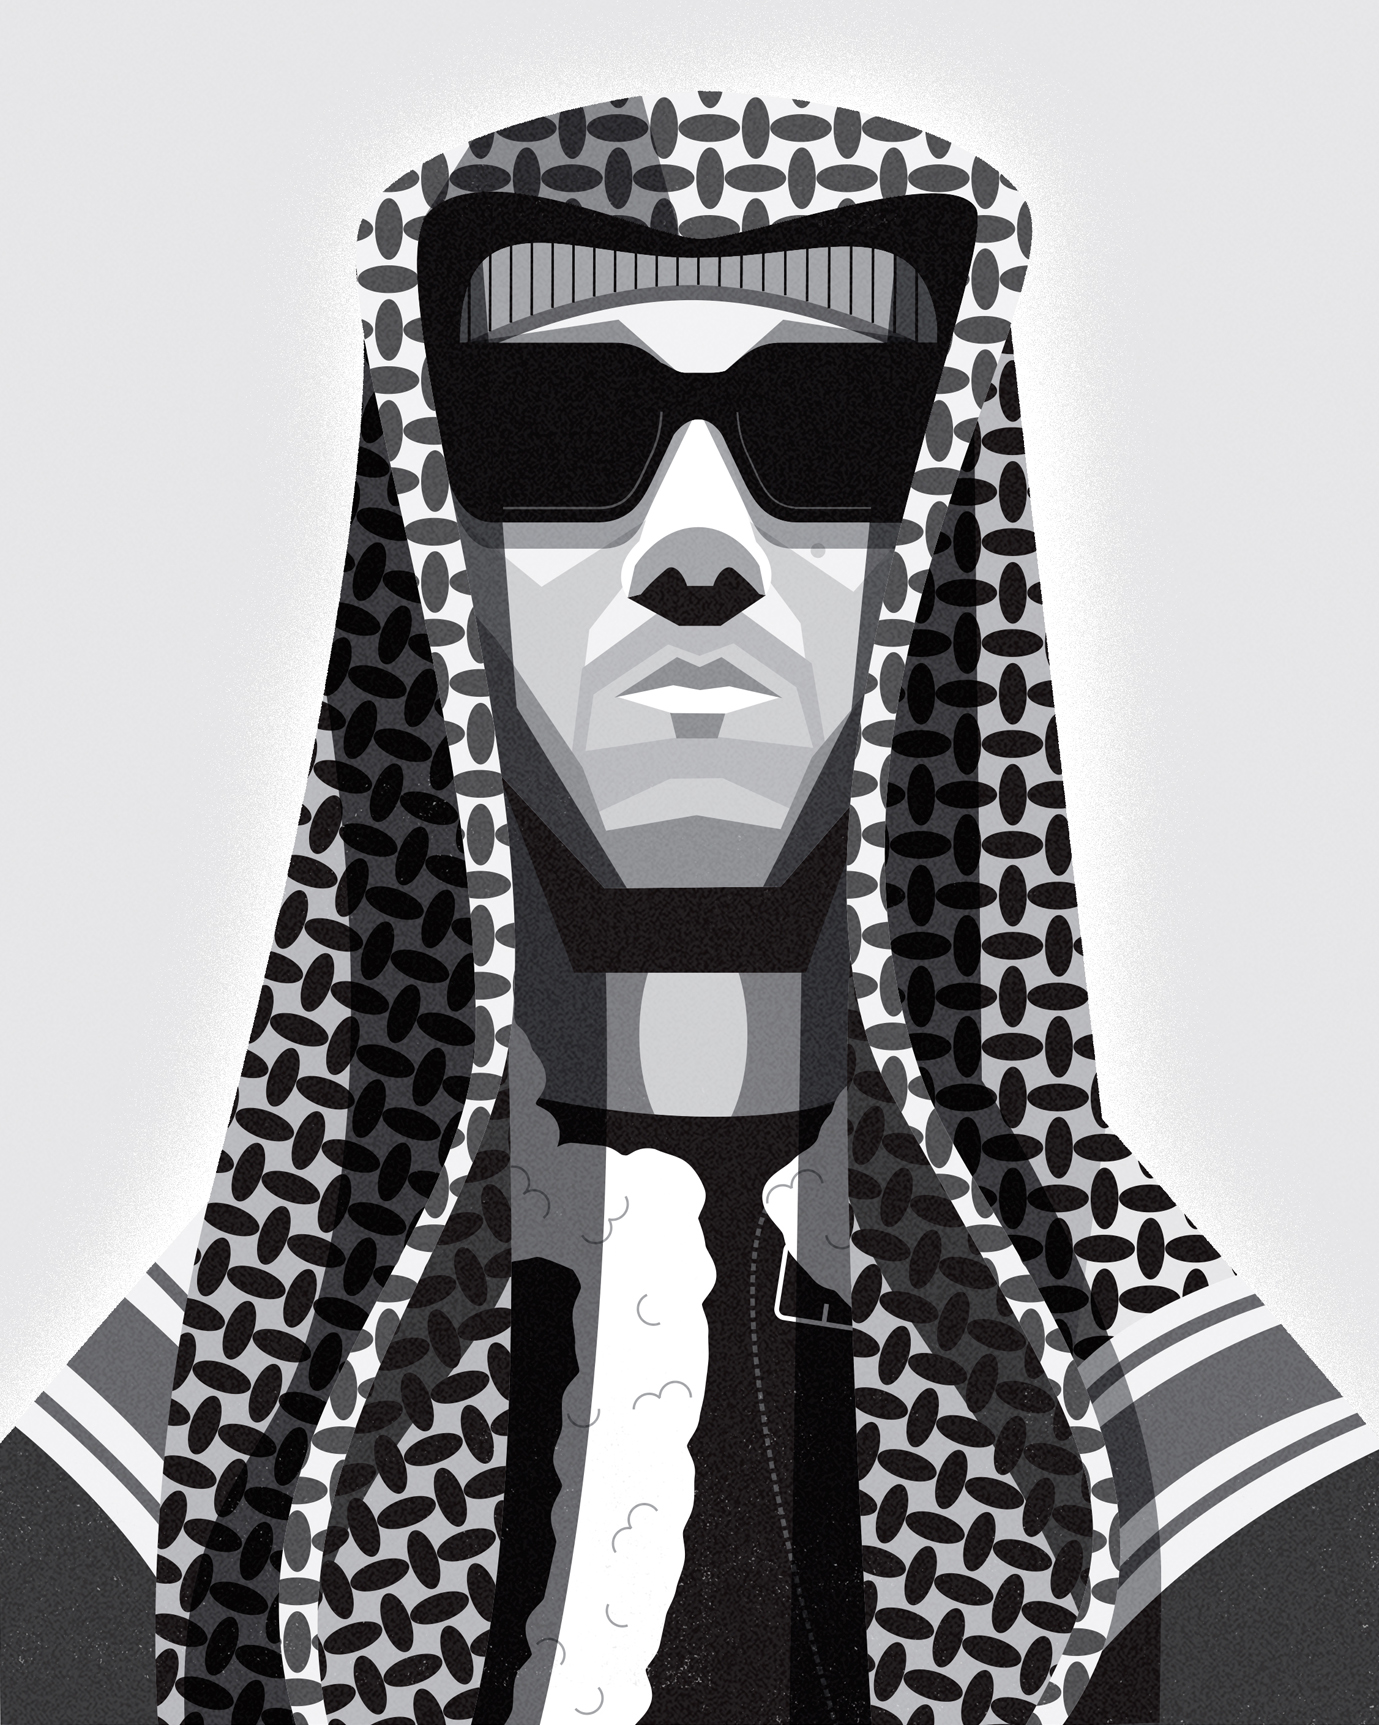 dale edwin murray freelance illustrator kamaal Williams portrait illustration